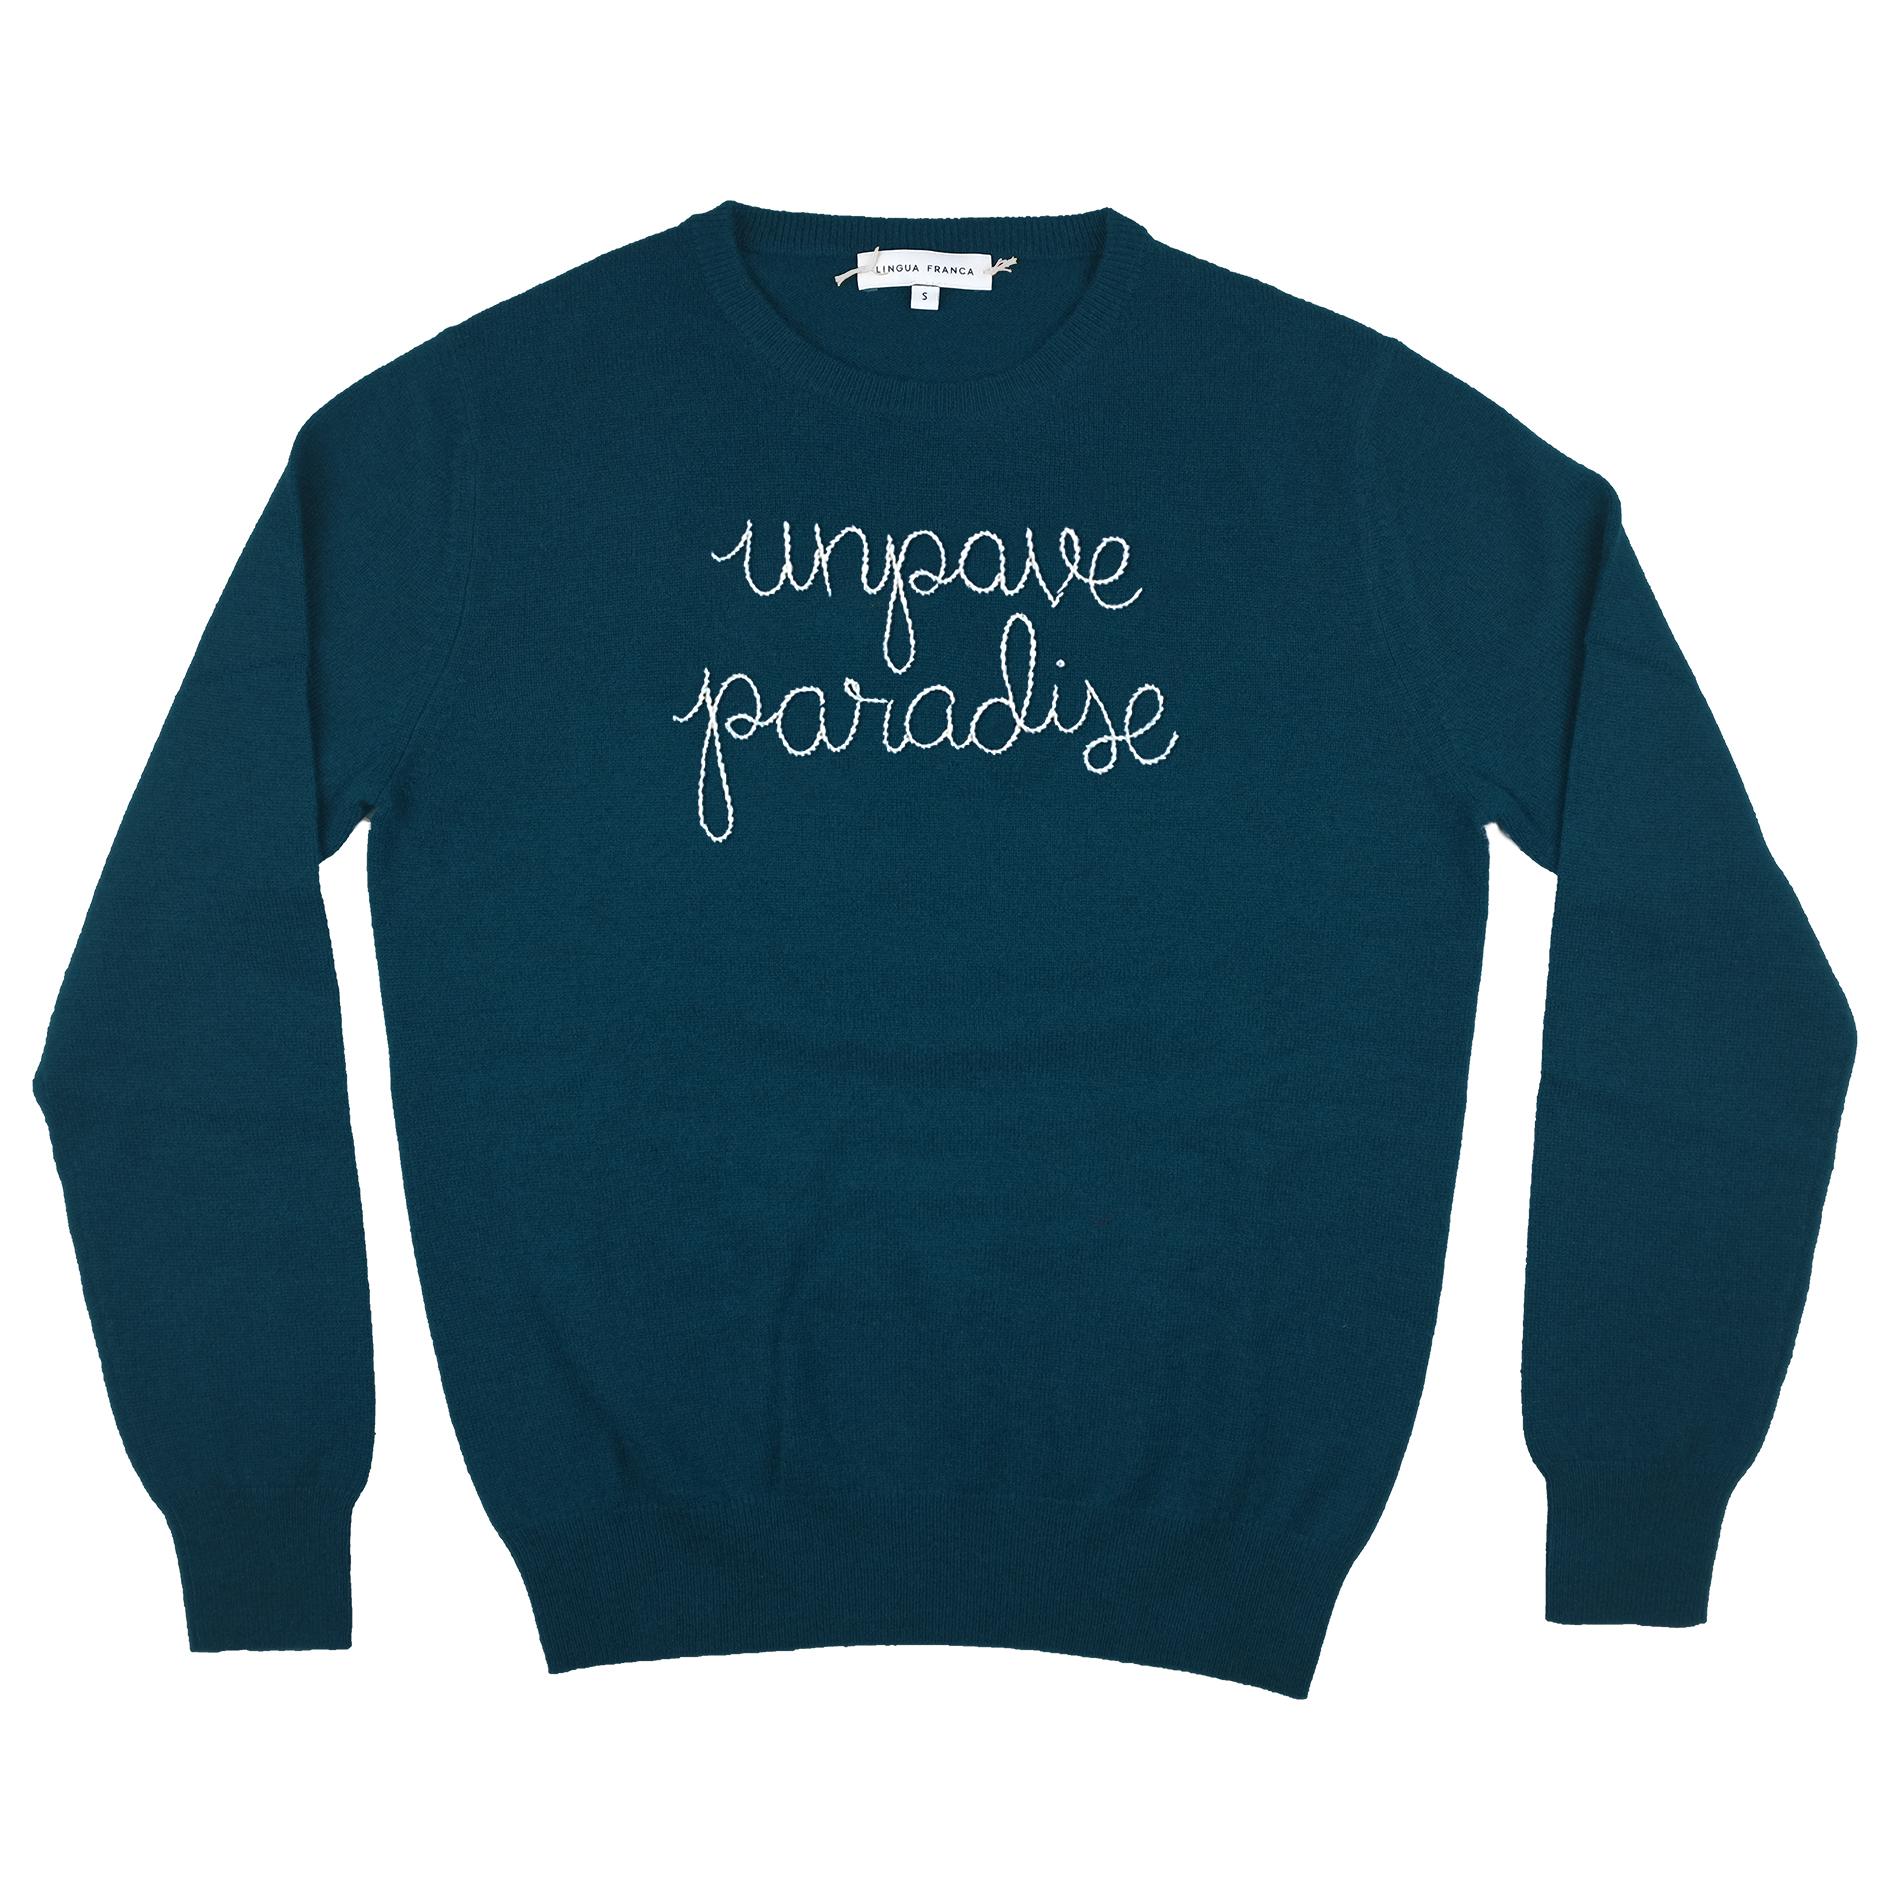 LF Sweater.jpg